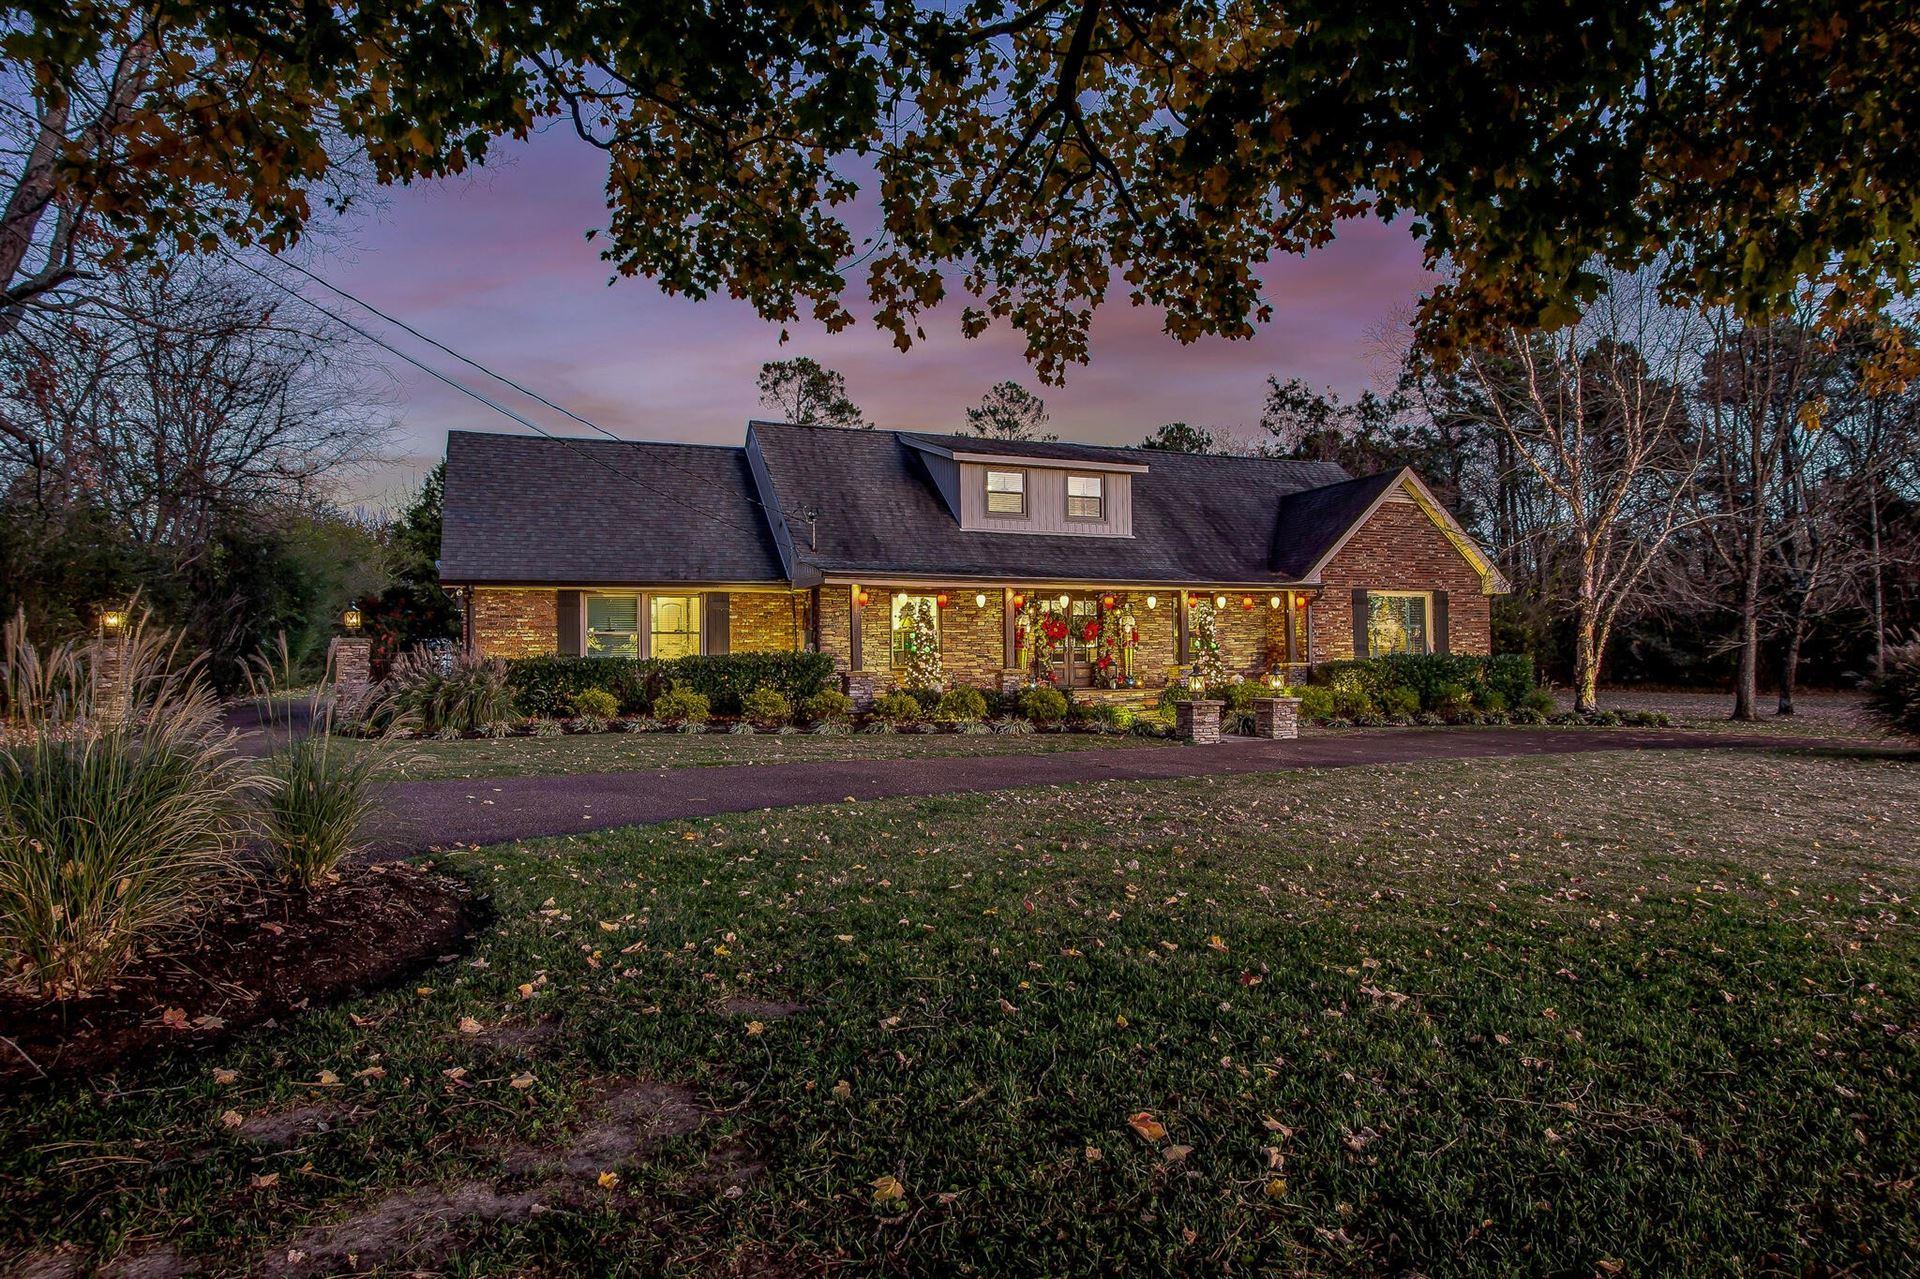 321 Indian Lake Rd, Hendersonville, TN 37075 - MLS#: 2210704